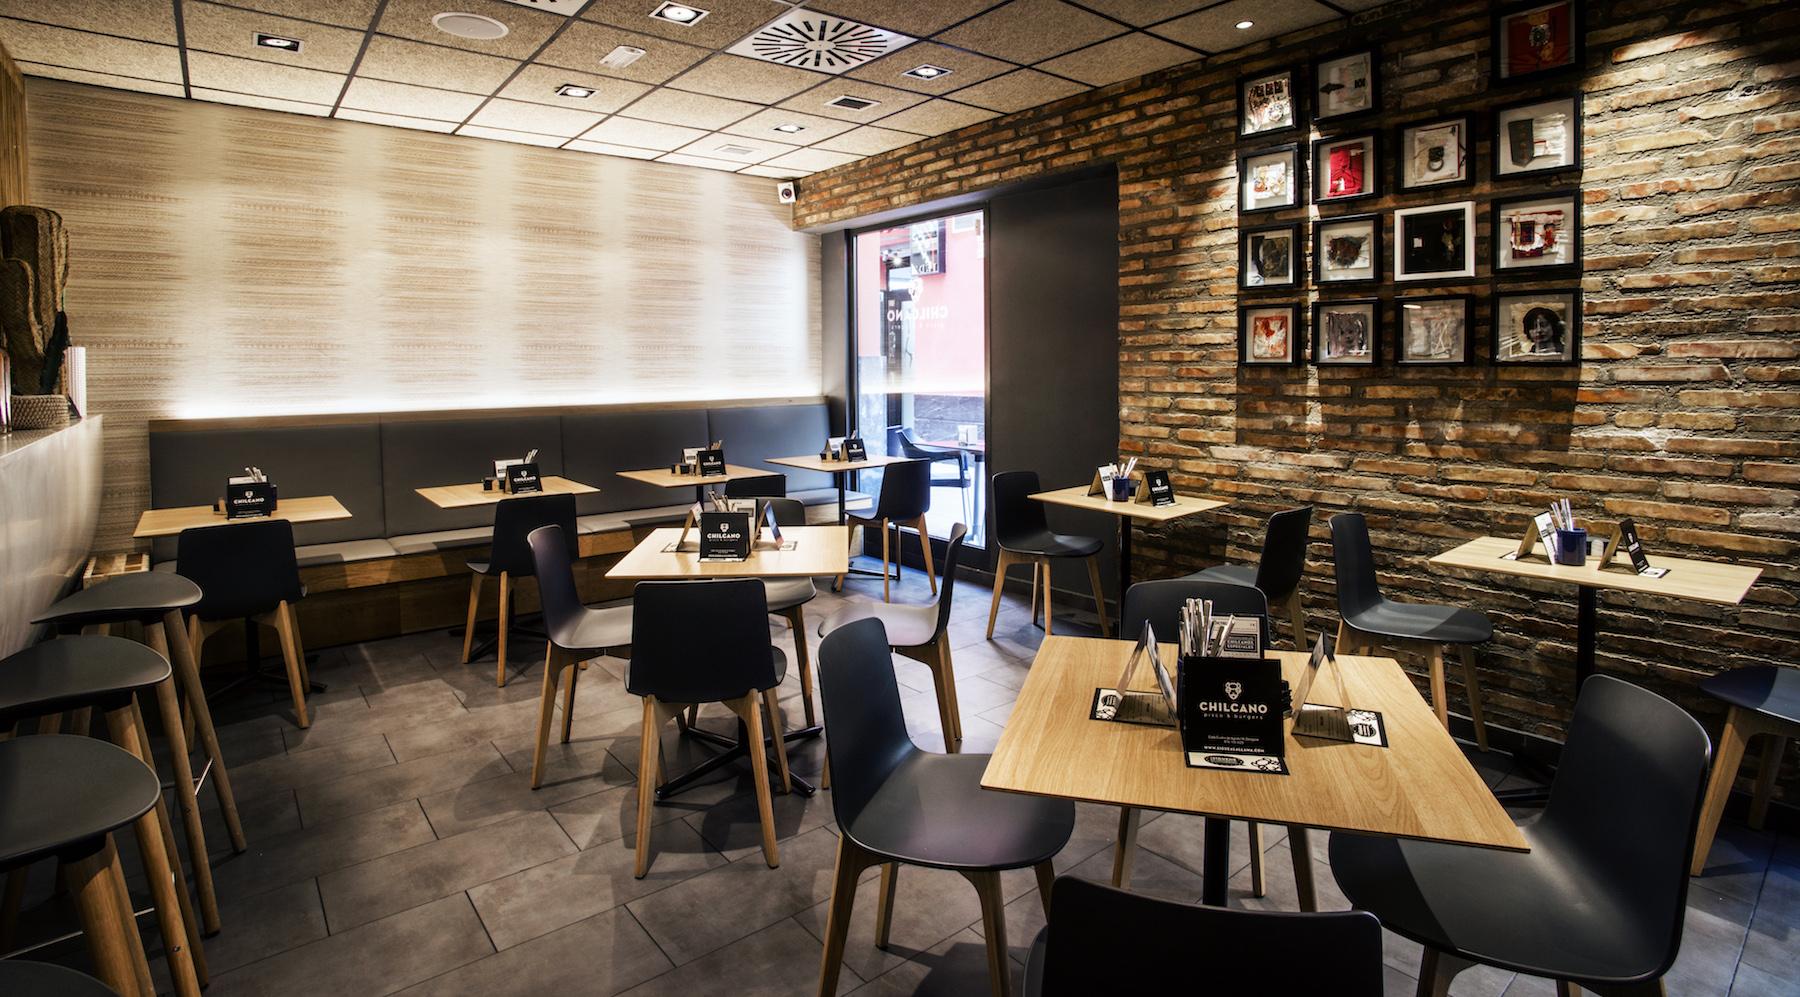 Chilcano Restaurante Enea Design Lottus Wood y Coma Wood